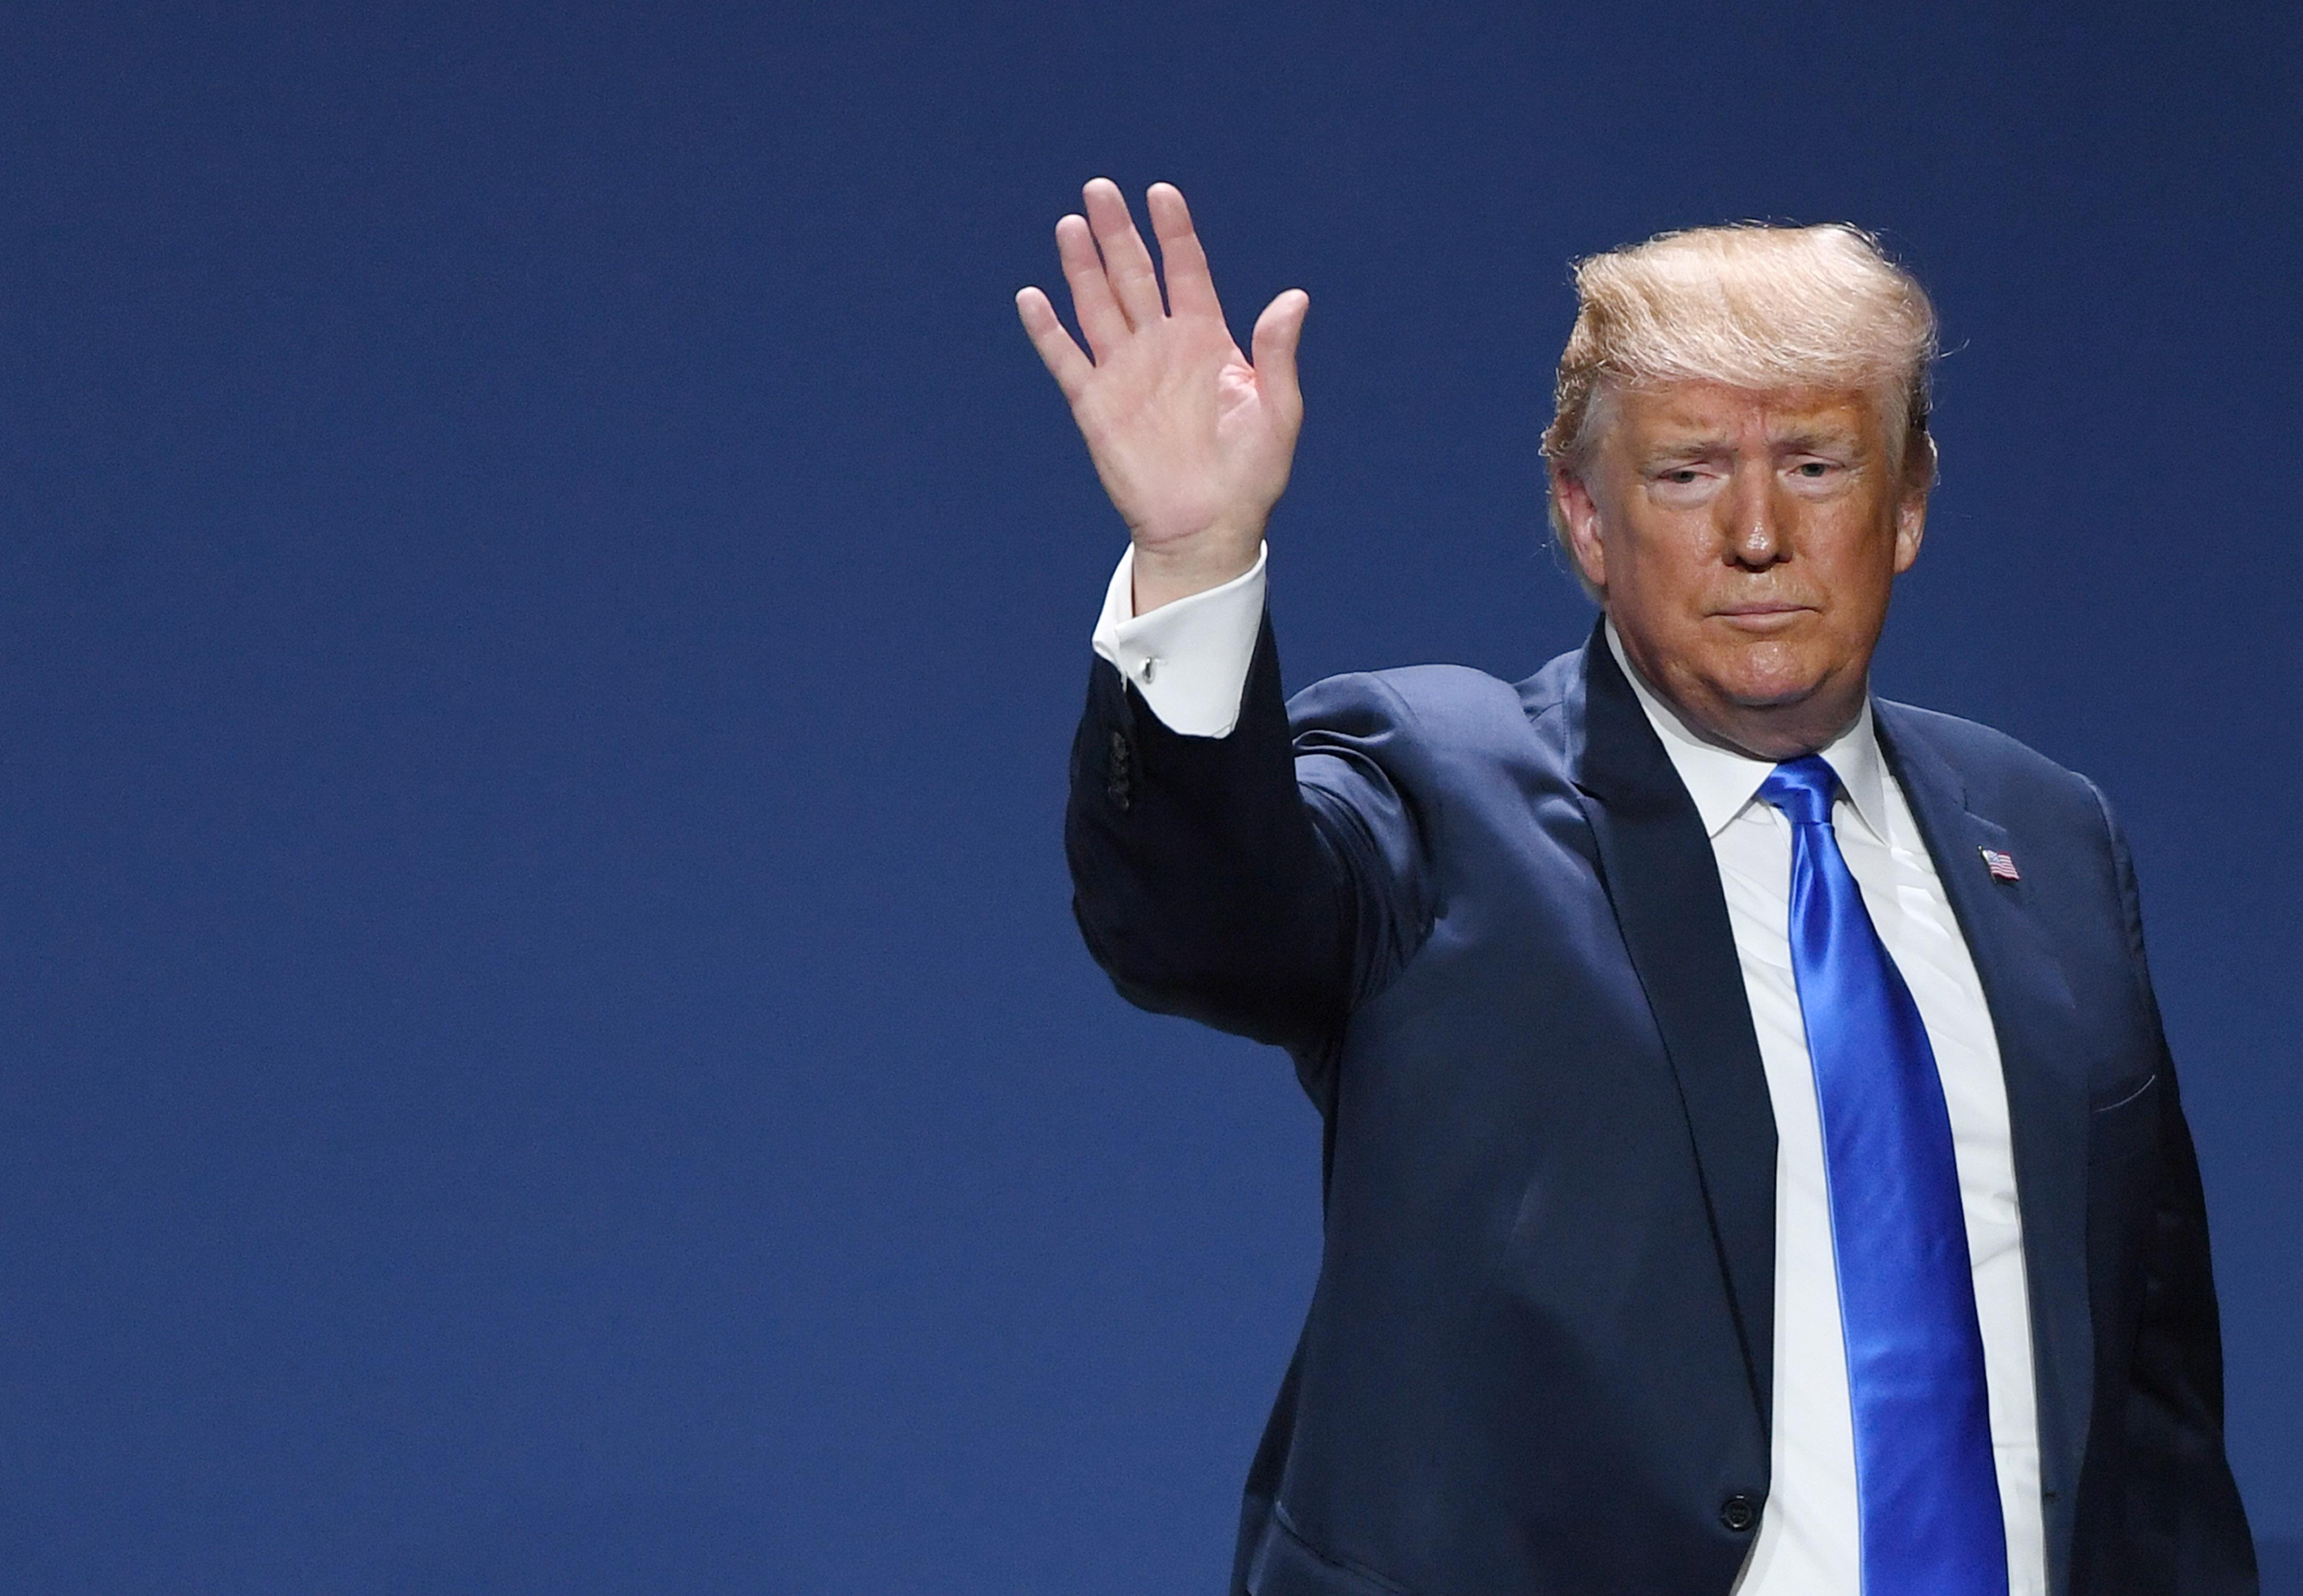 President Donald Trump Among Speakers At Republican Jewish Coalition In Las Vegas